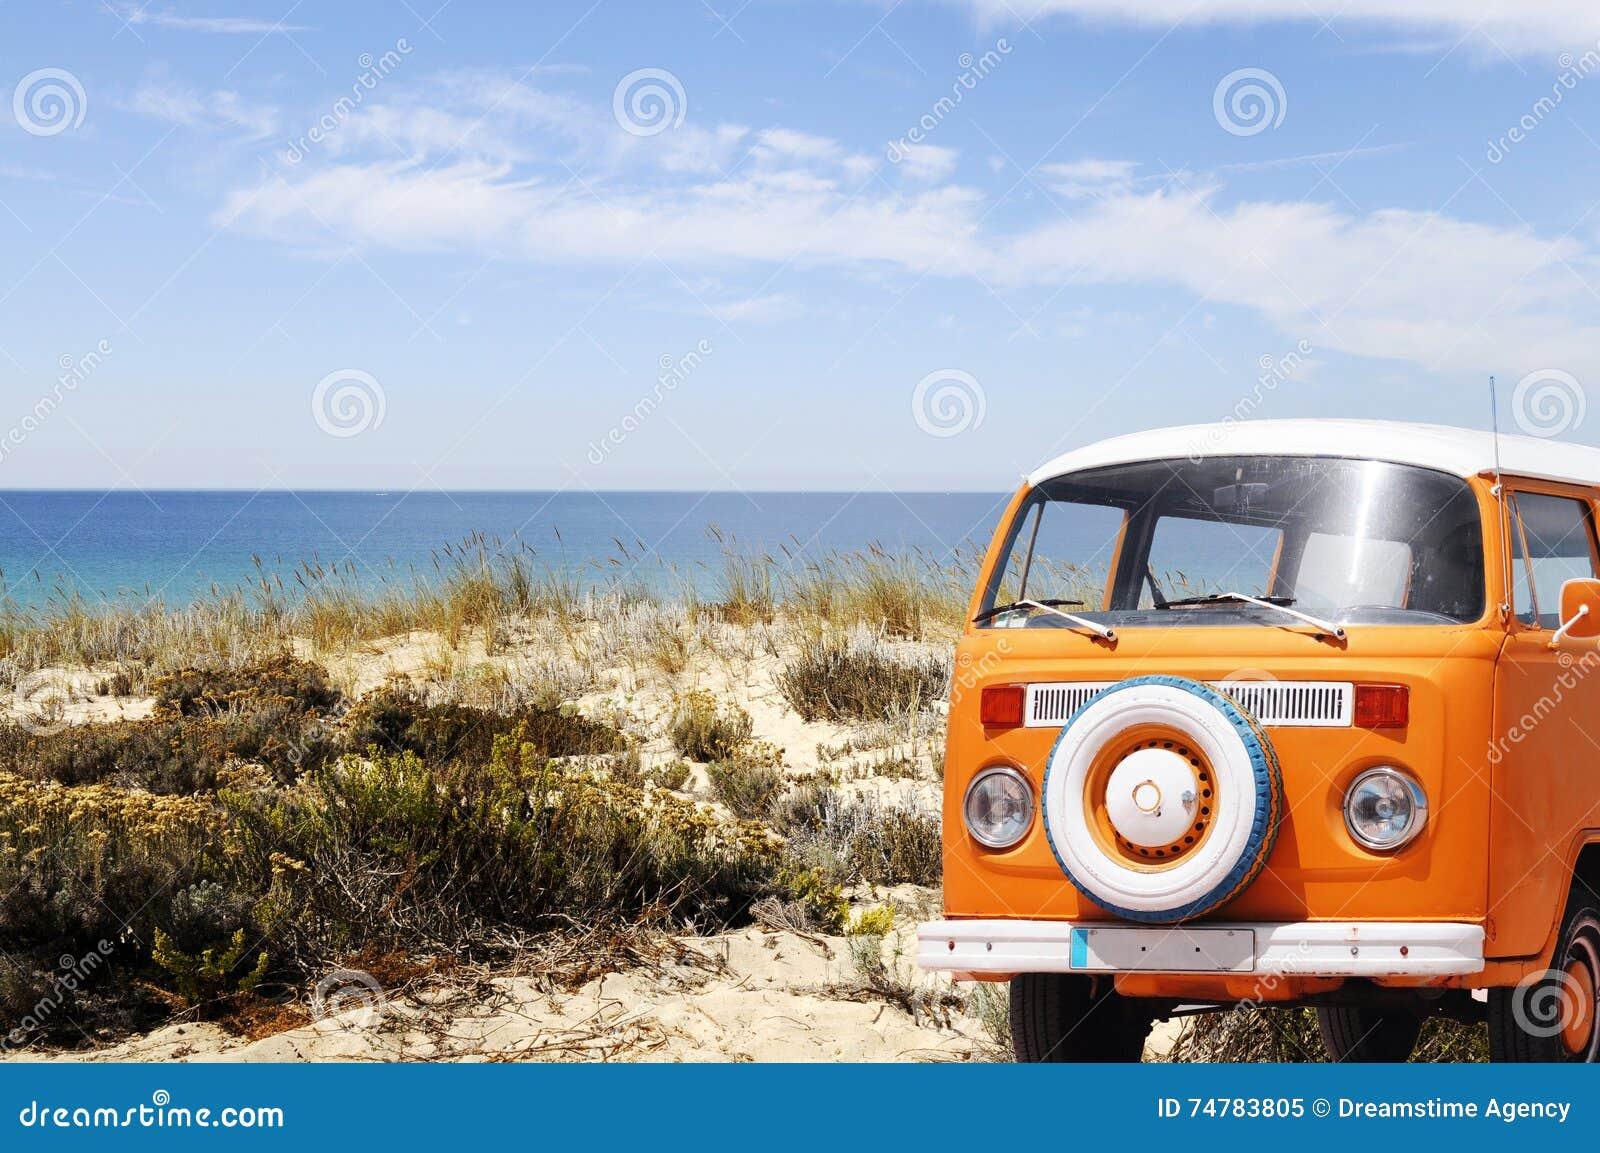 Summer Time, Sandy Beach Holidays, Fun